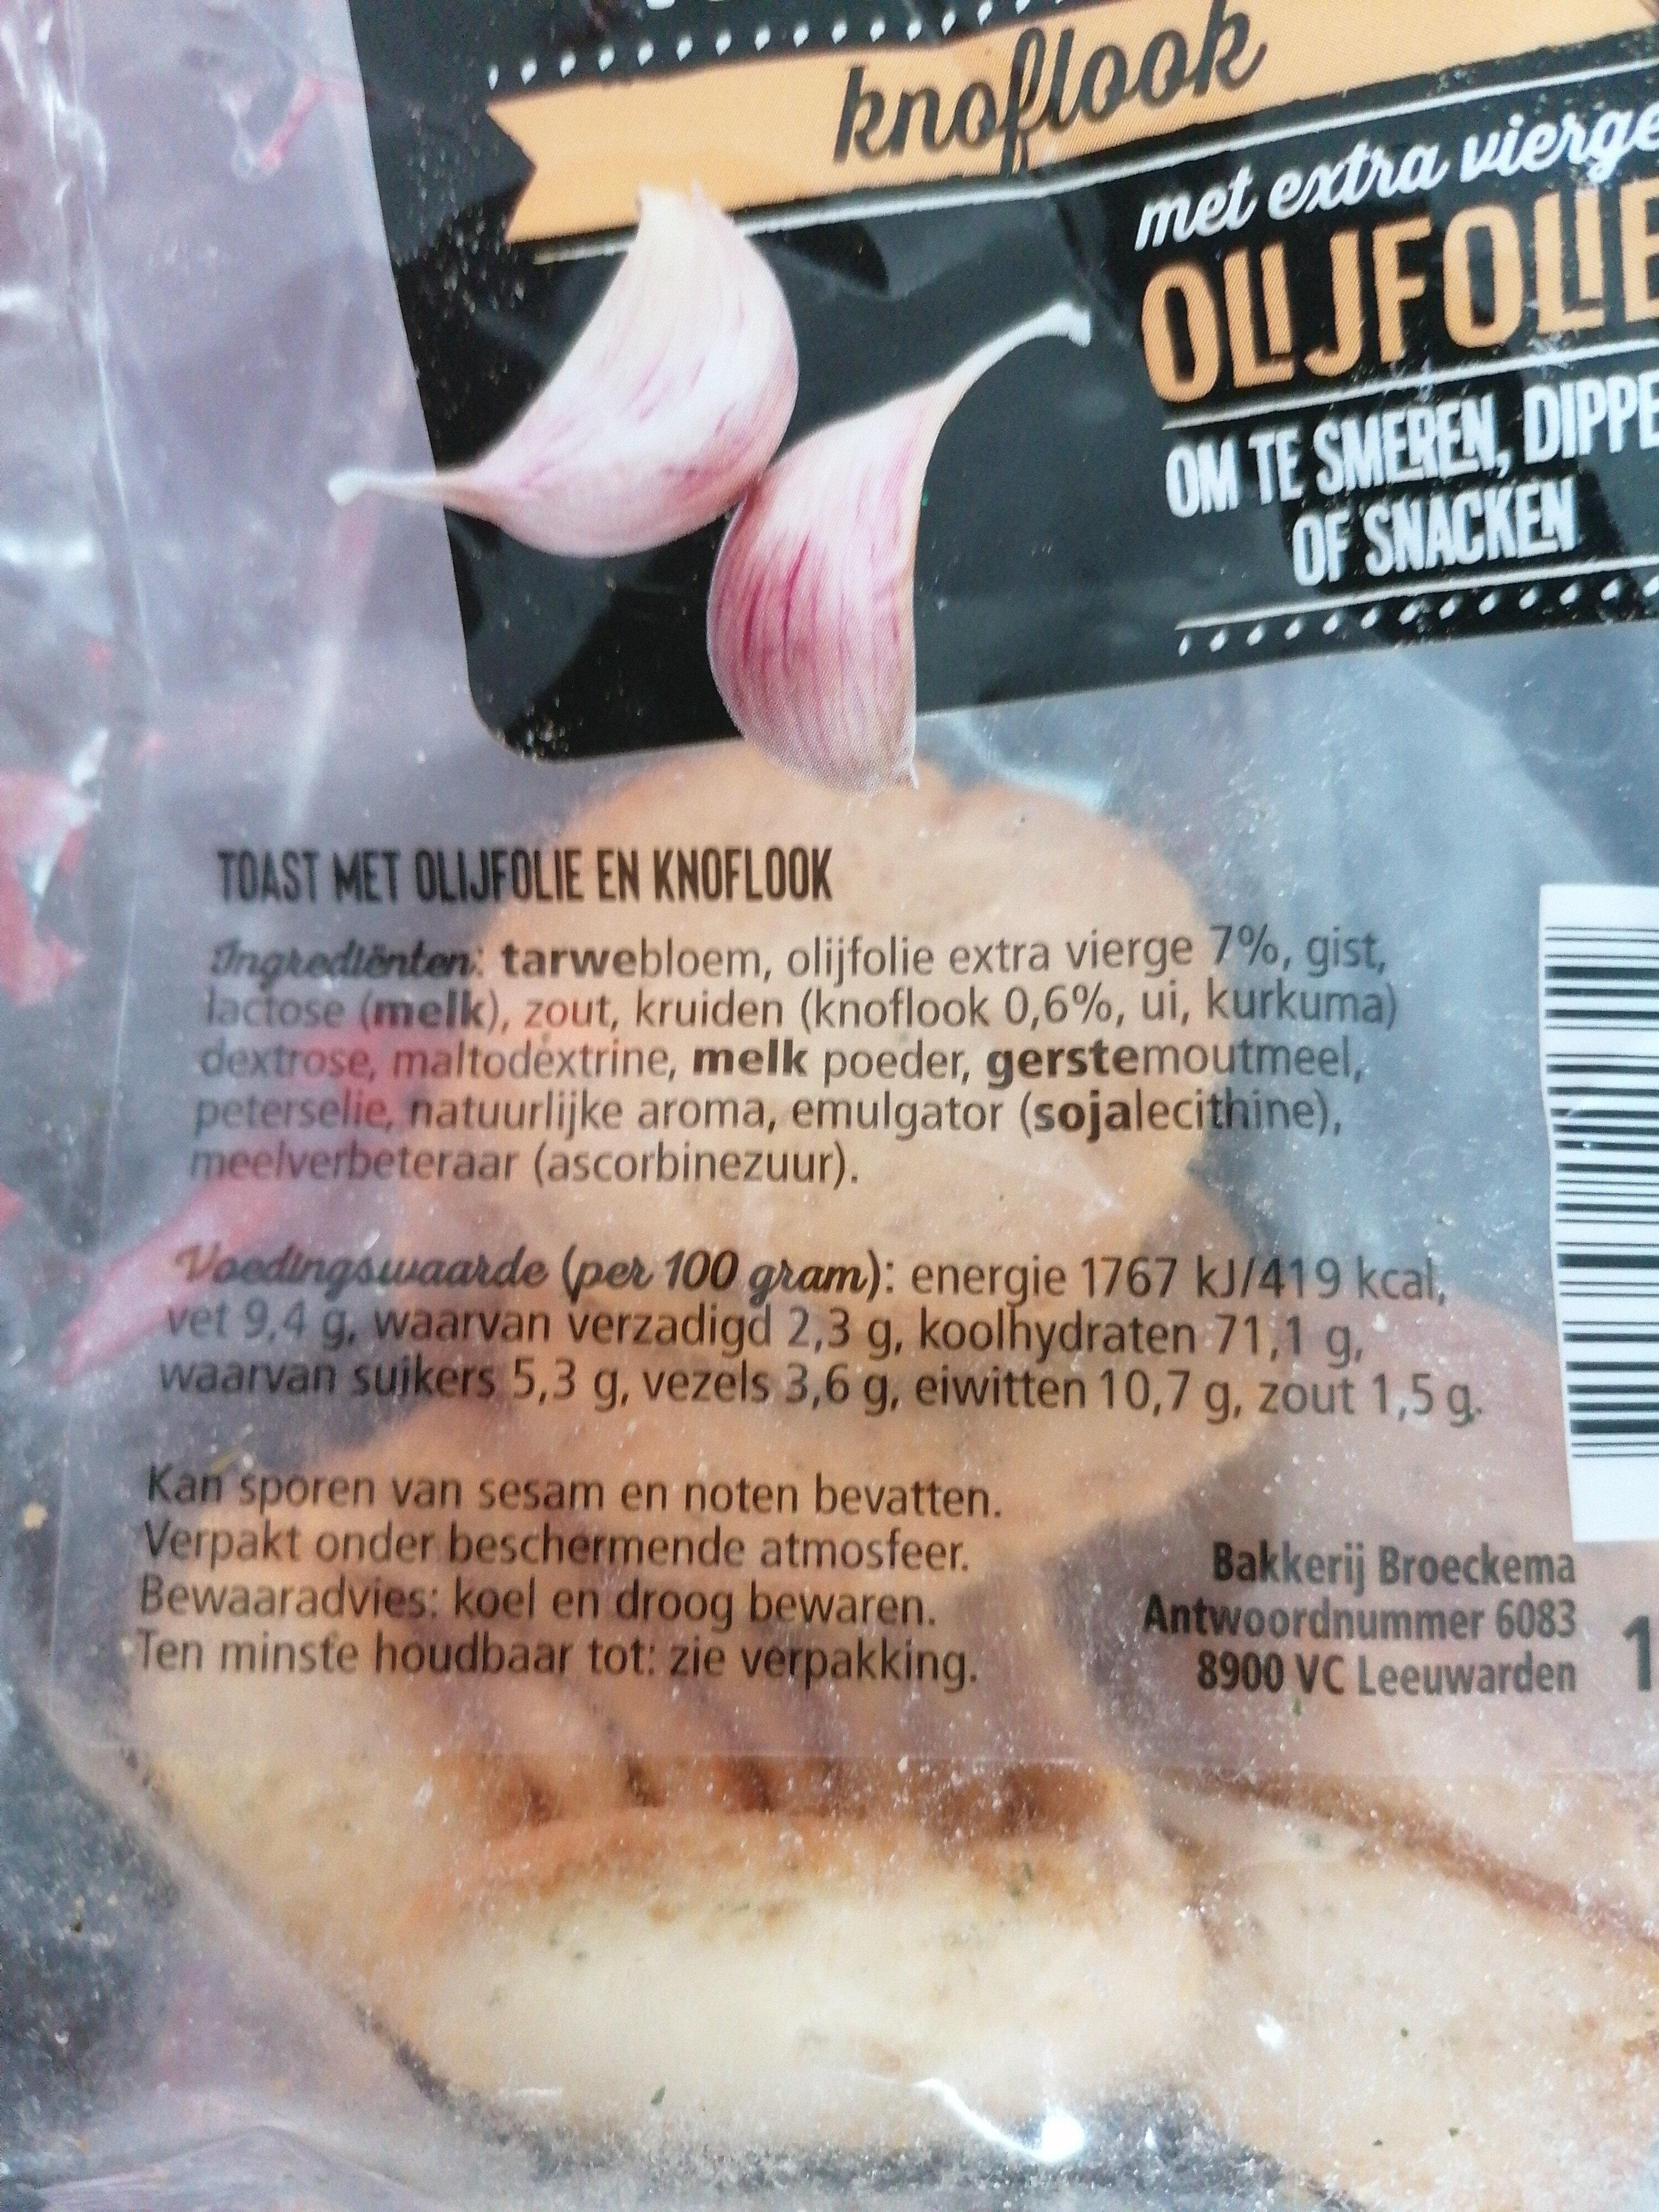 Borrel Toast klassiek knoflook - Ingrediënten - nl